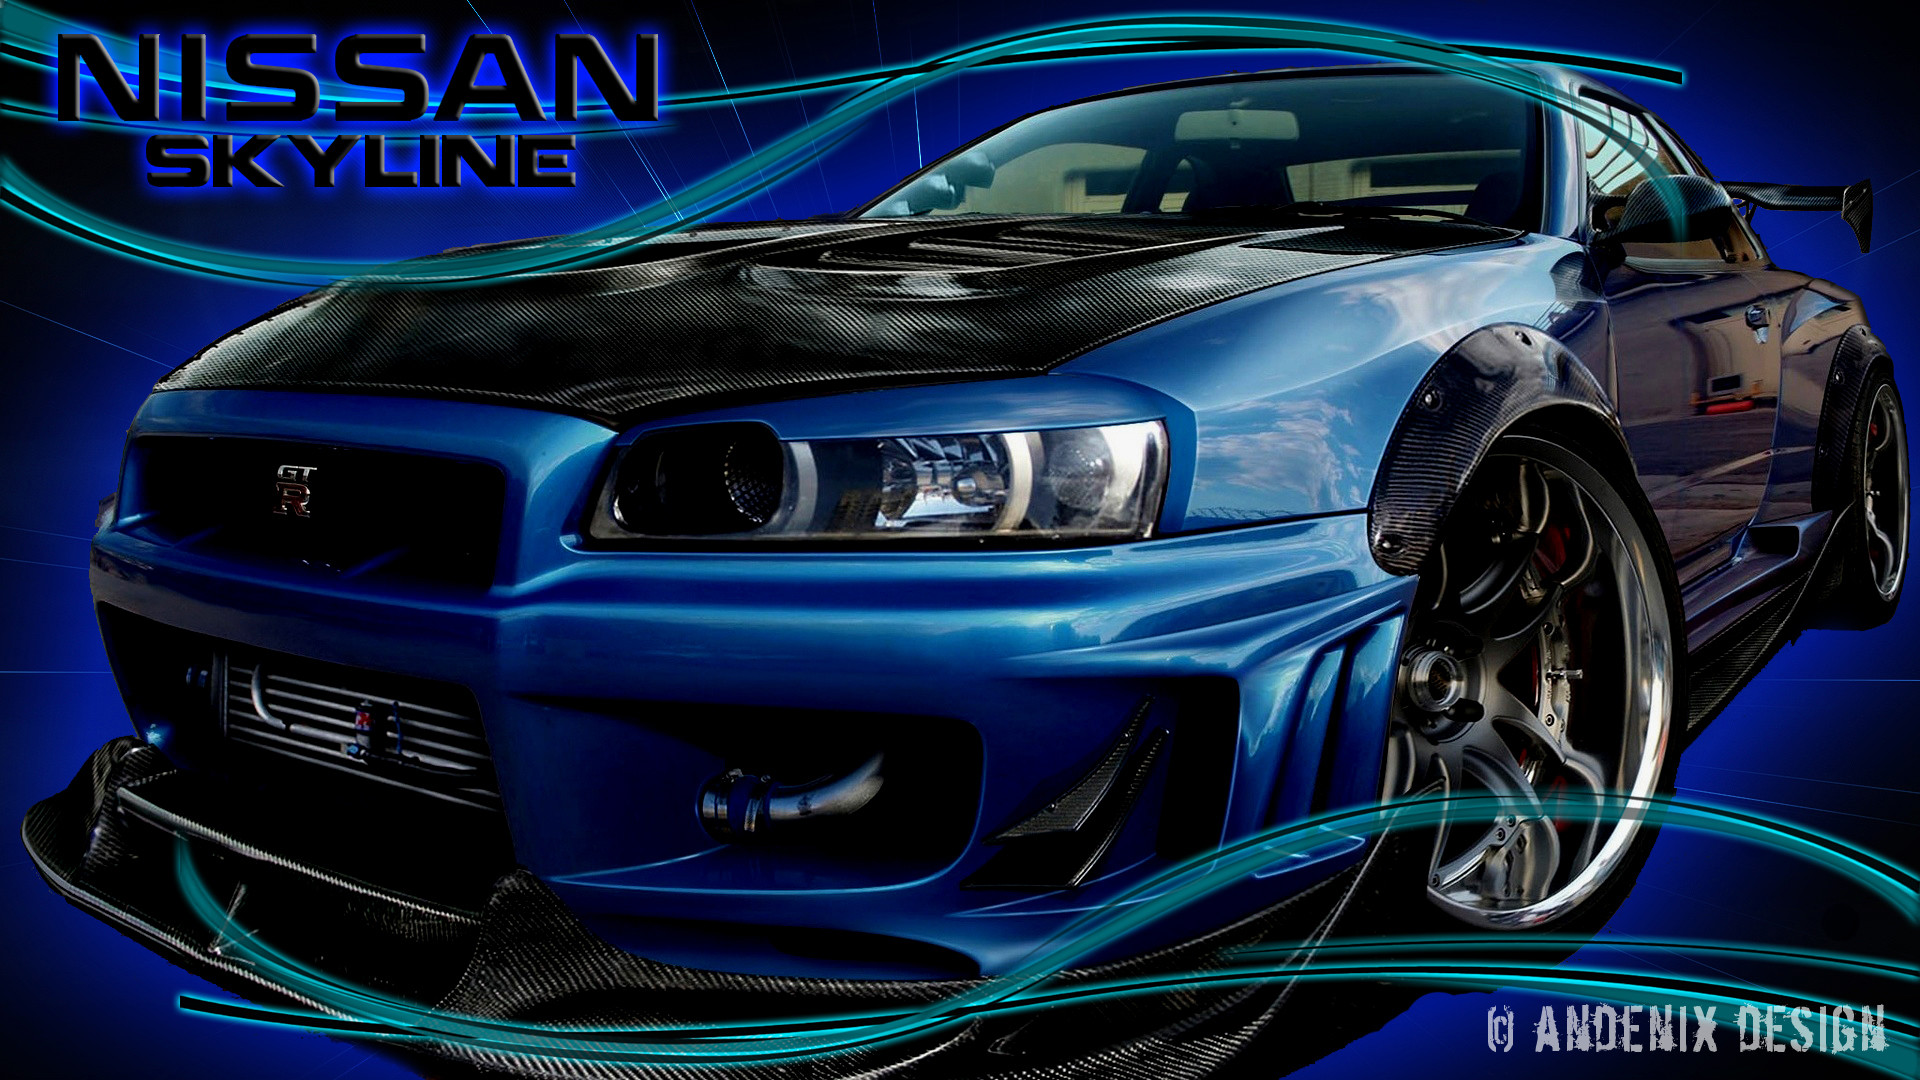 Nissan Skyline Wallpaper 68 Images